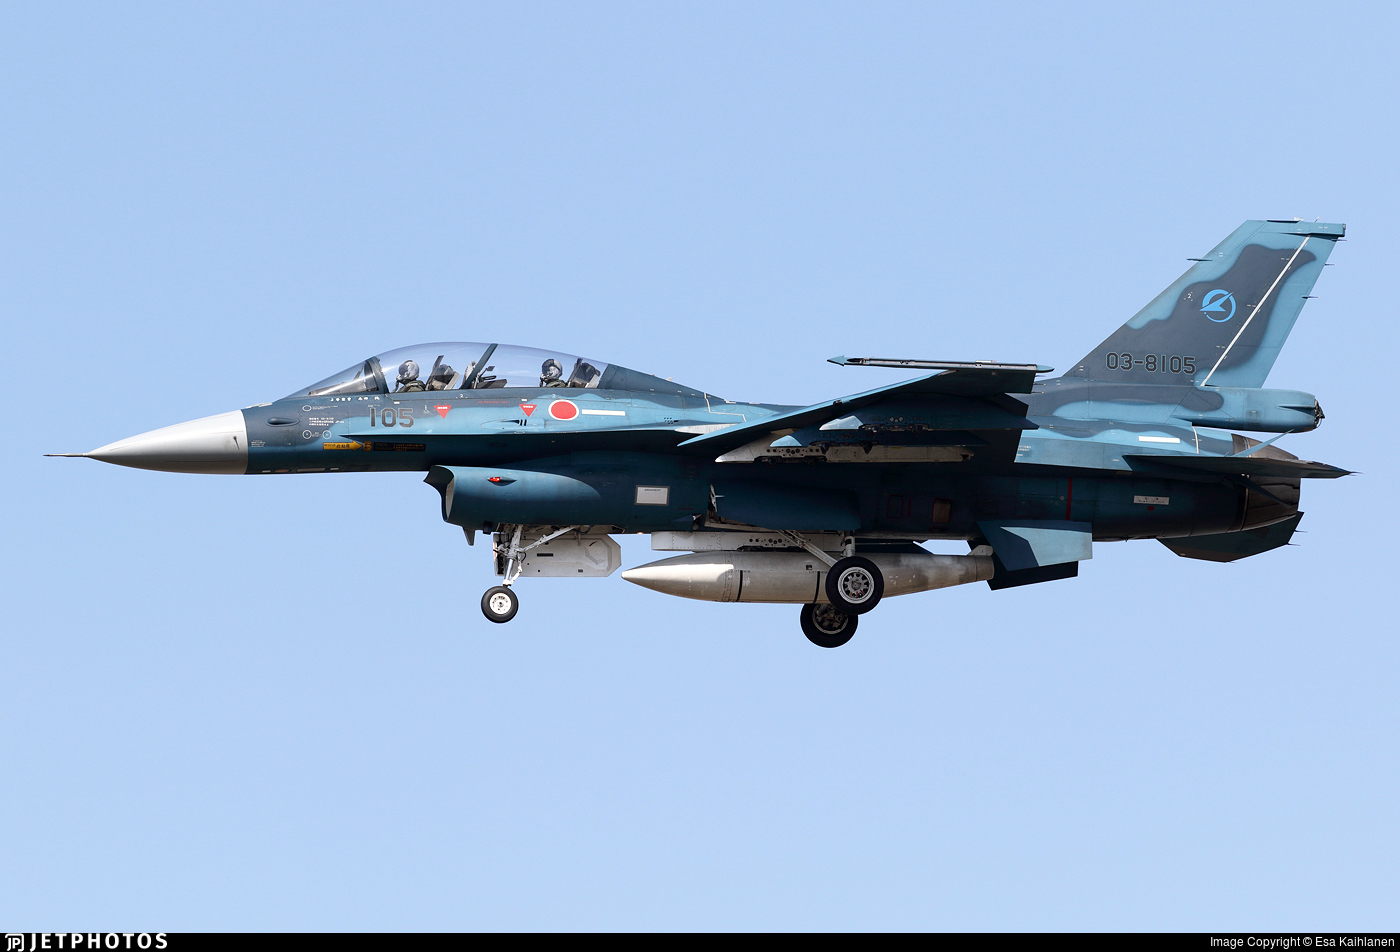 03-8105 - Mitsubishi F-2B - Japan - Air Self Defence Force (JASDF)